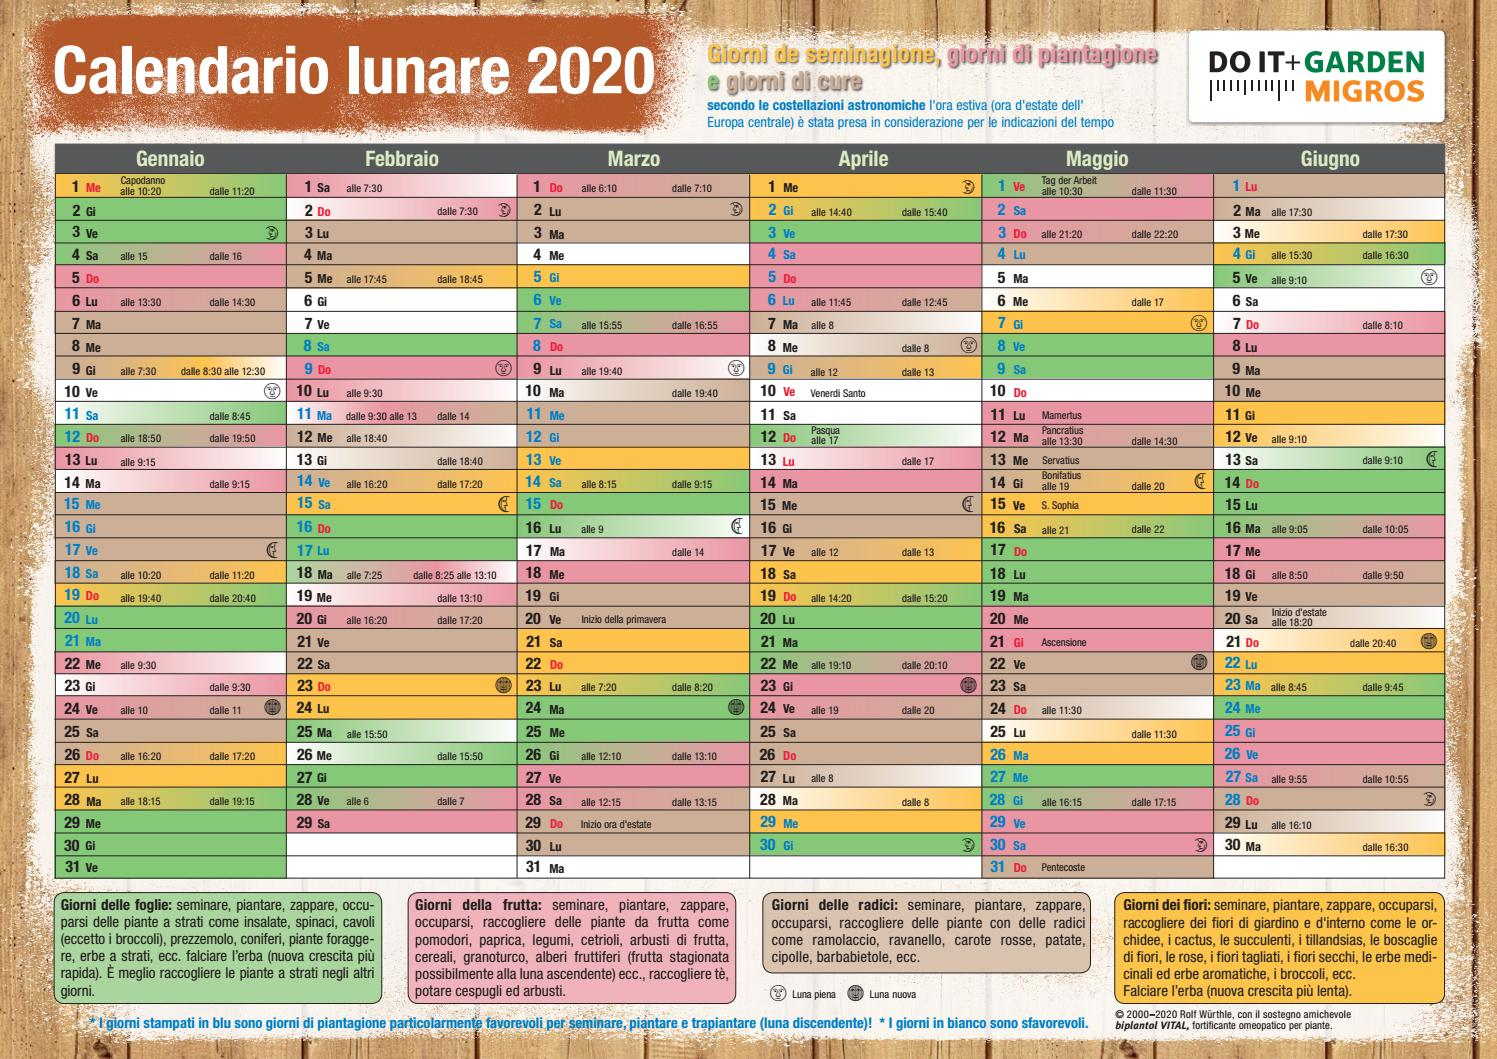 Do it + Garden Calendario lunare 2020 by Migros   issuu